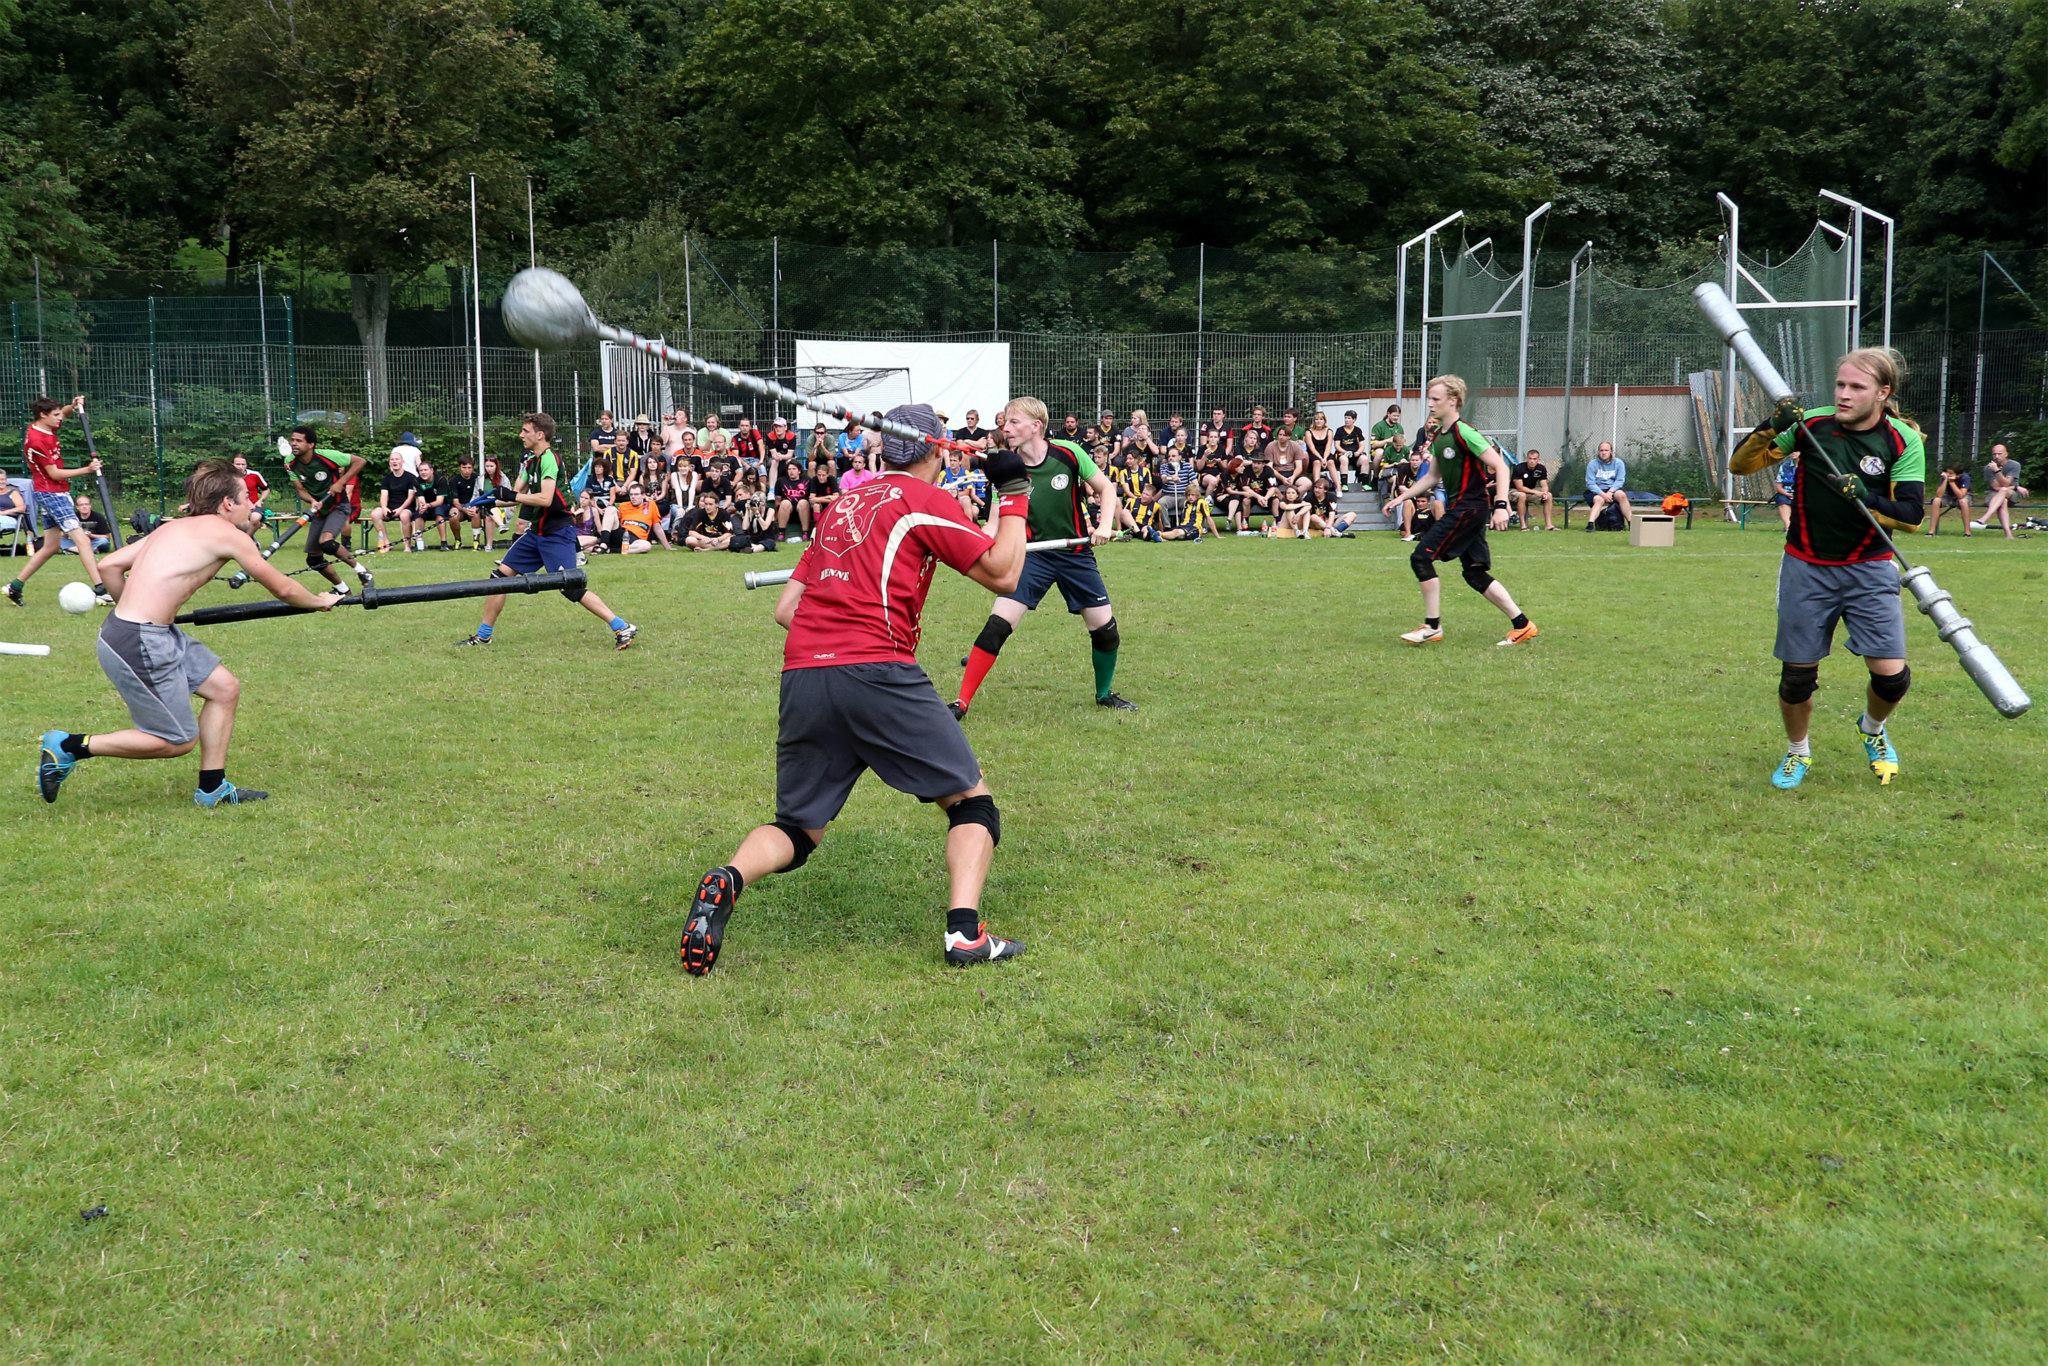 Jugger Wuppertal | Jugger?! - Jugger Turniere